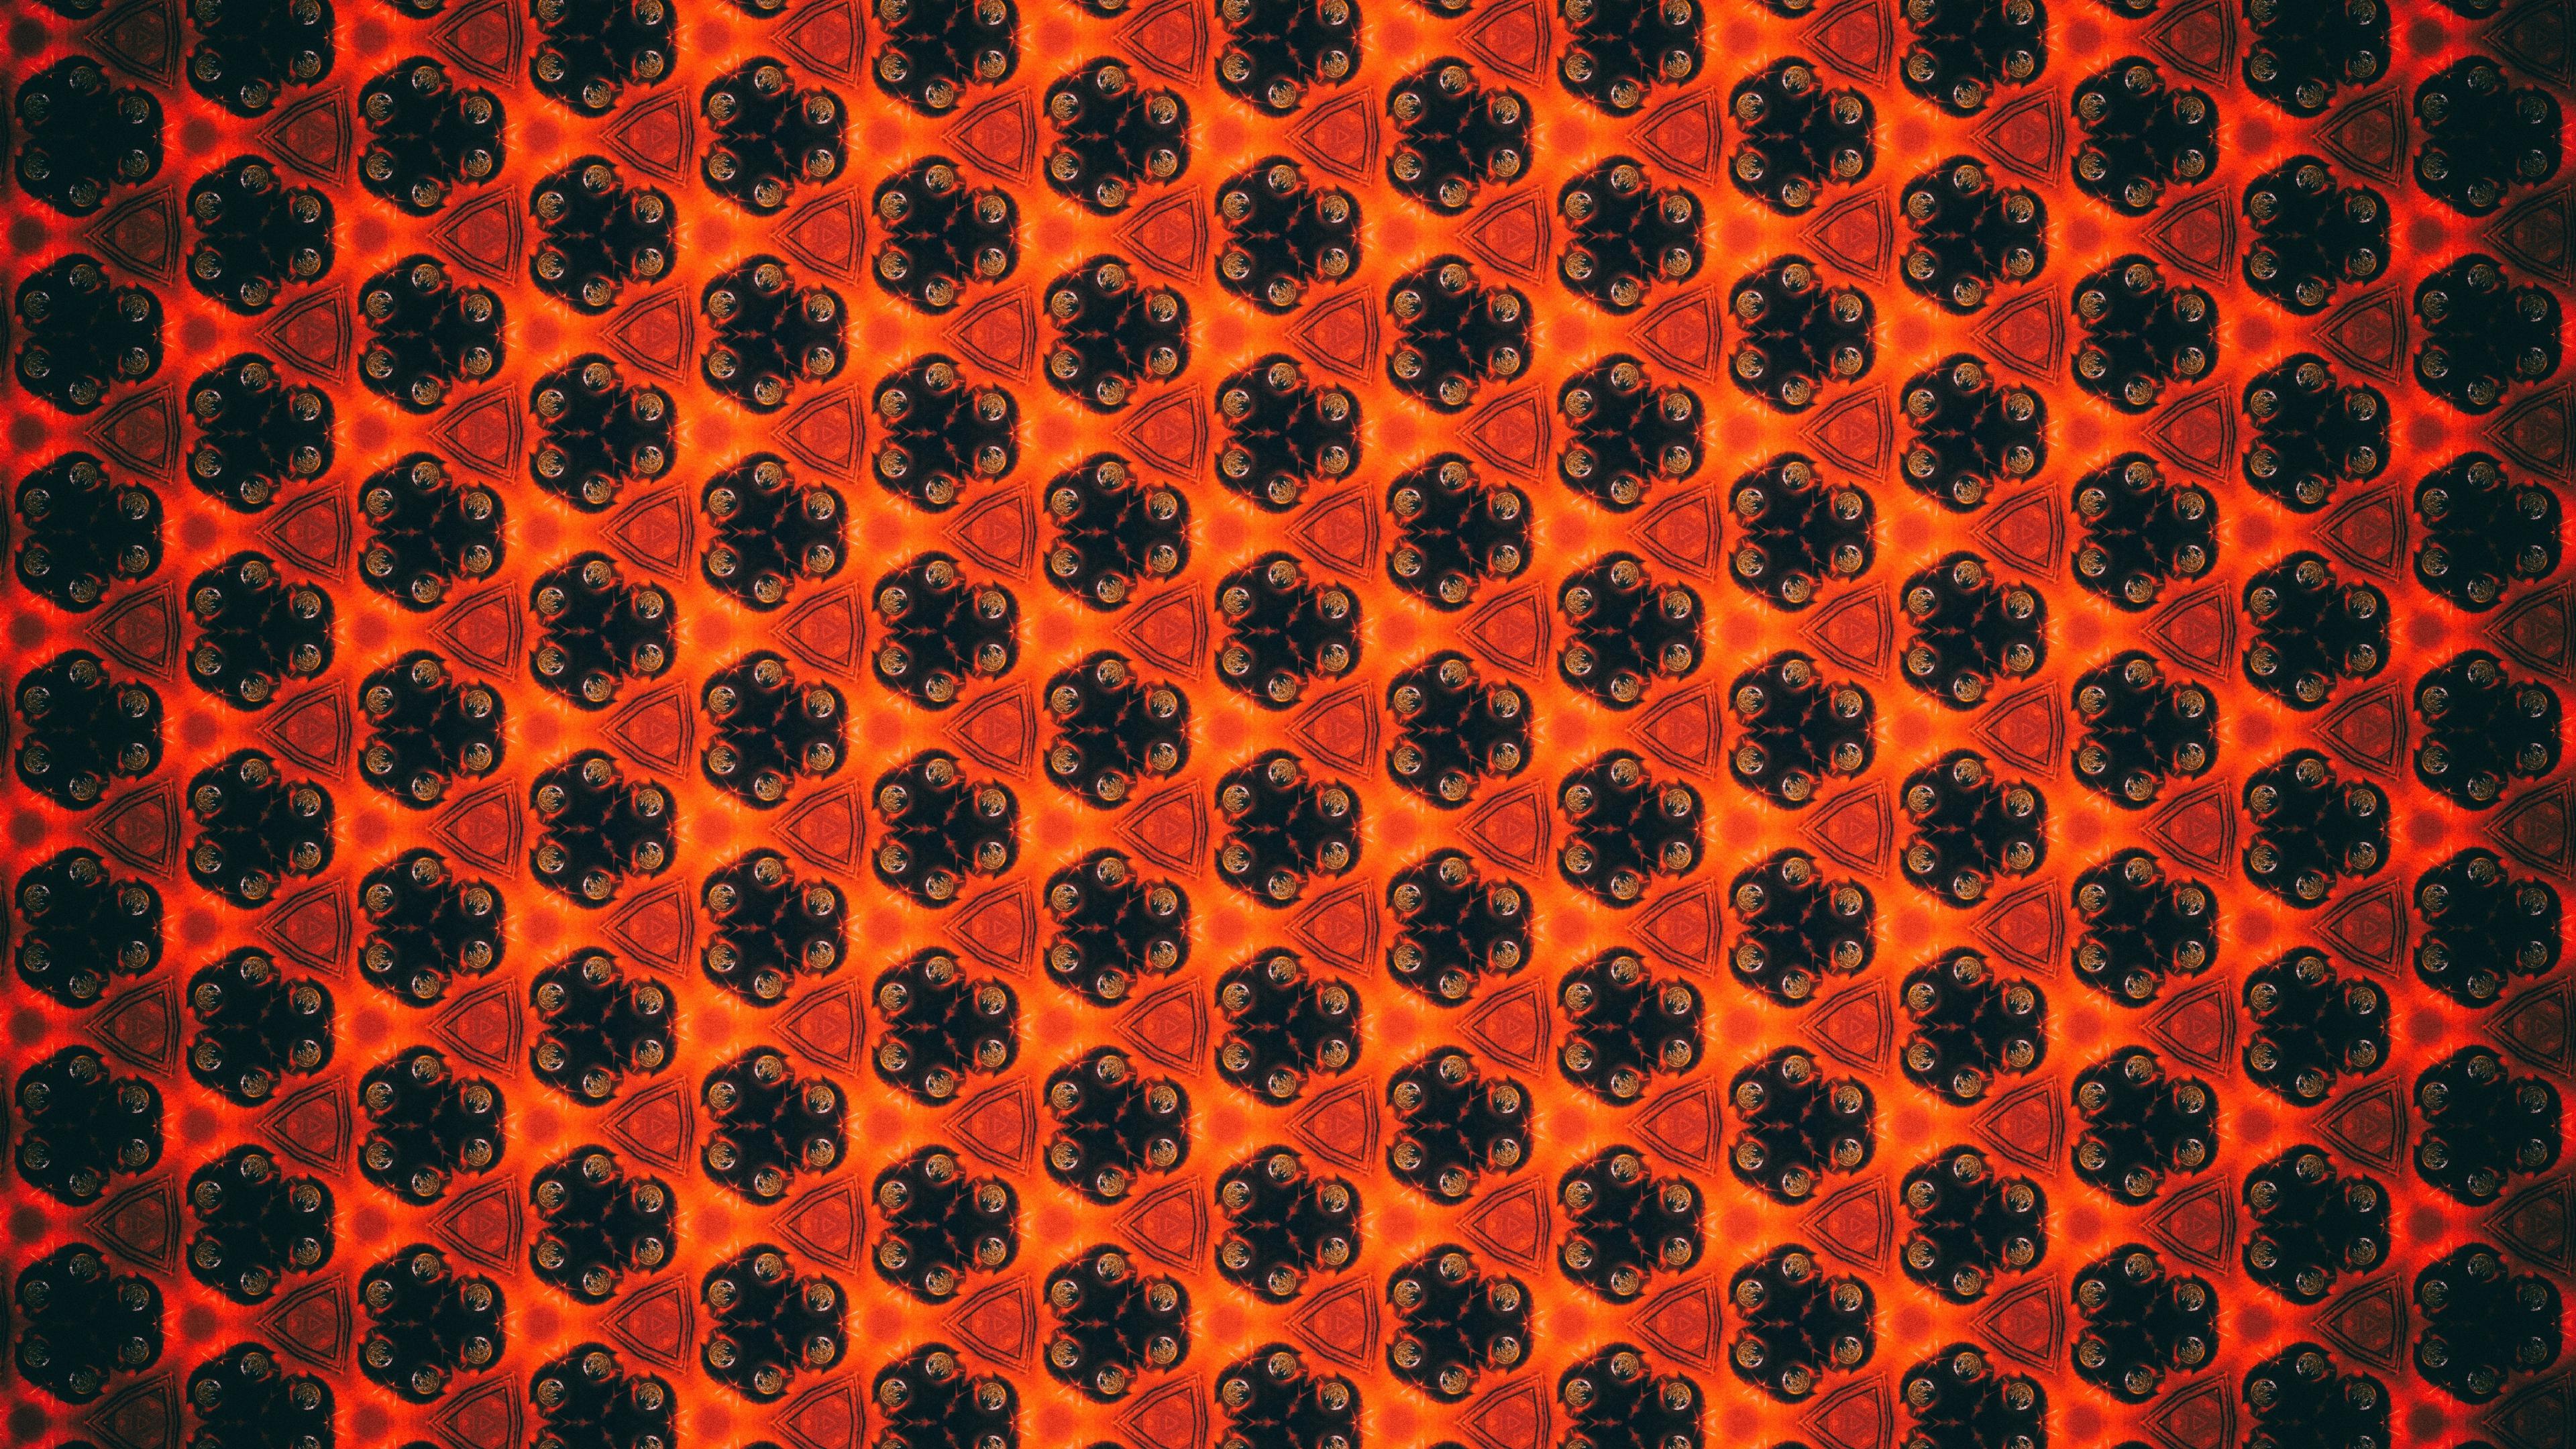 patterns flowers shapes 4k 1539369929 - patterns, flowers, shapes 4k - Shapes, patterns, Flowers